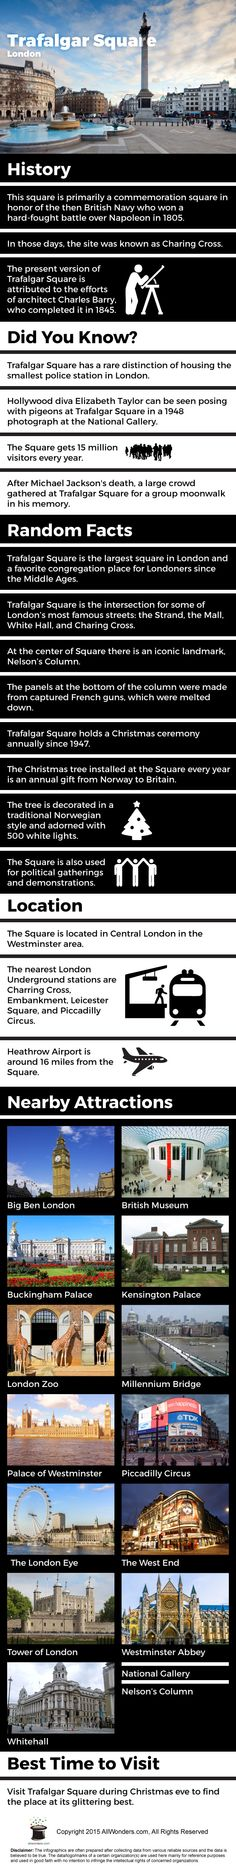 Trafalgar Square Infographic -